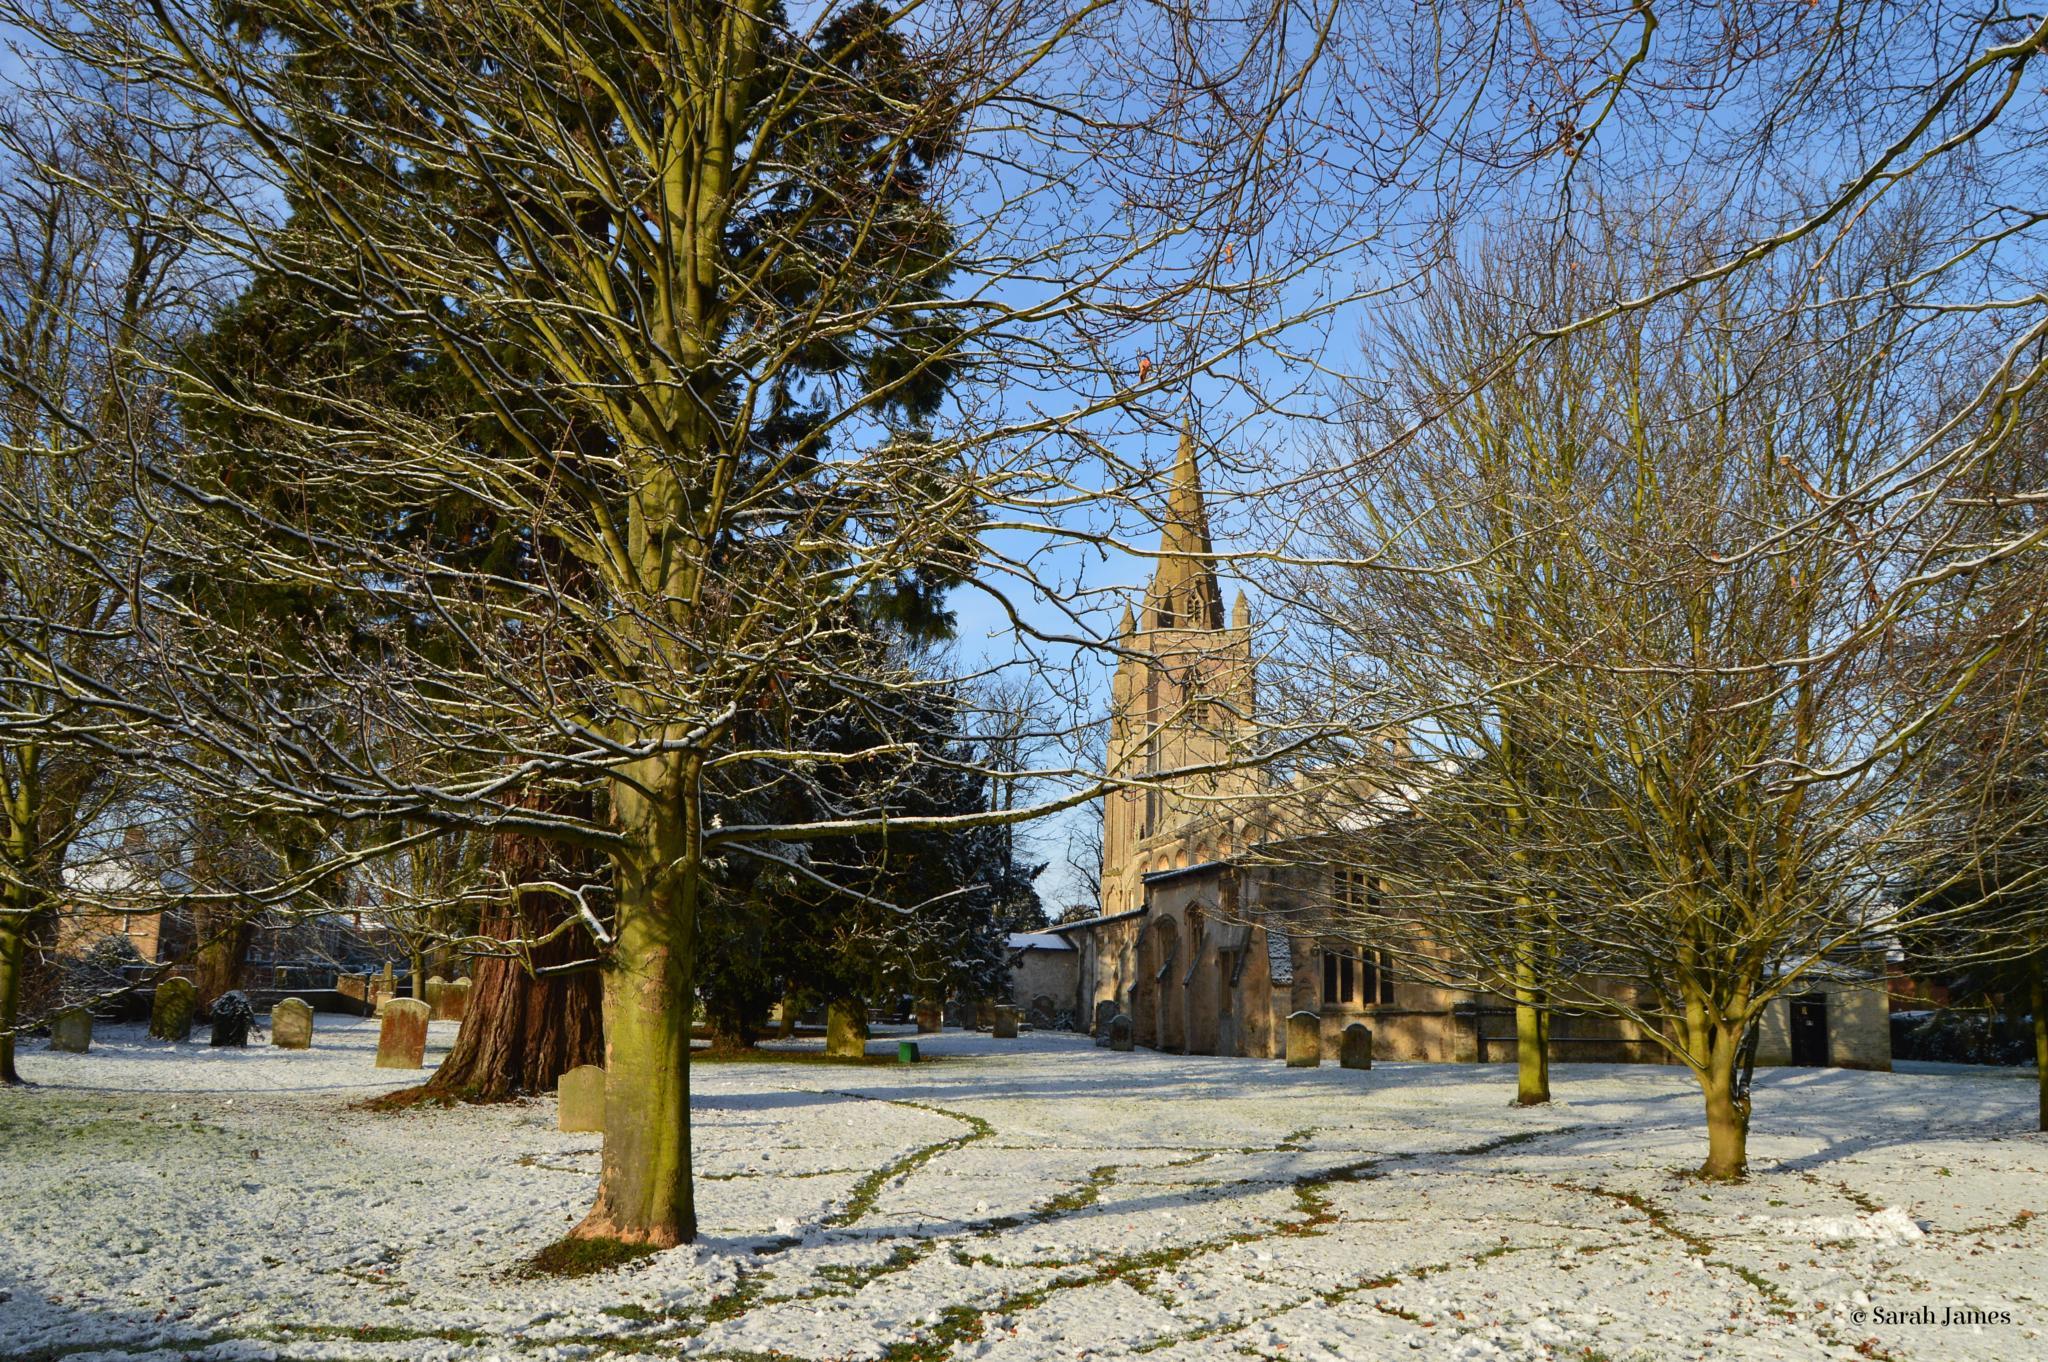 Walsoken church 3 by Sarah James